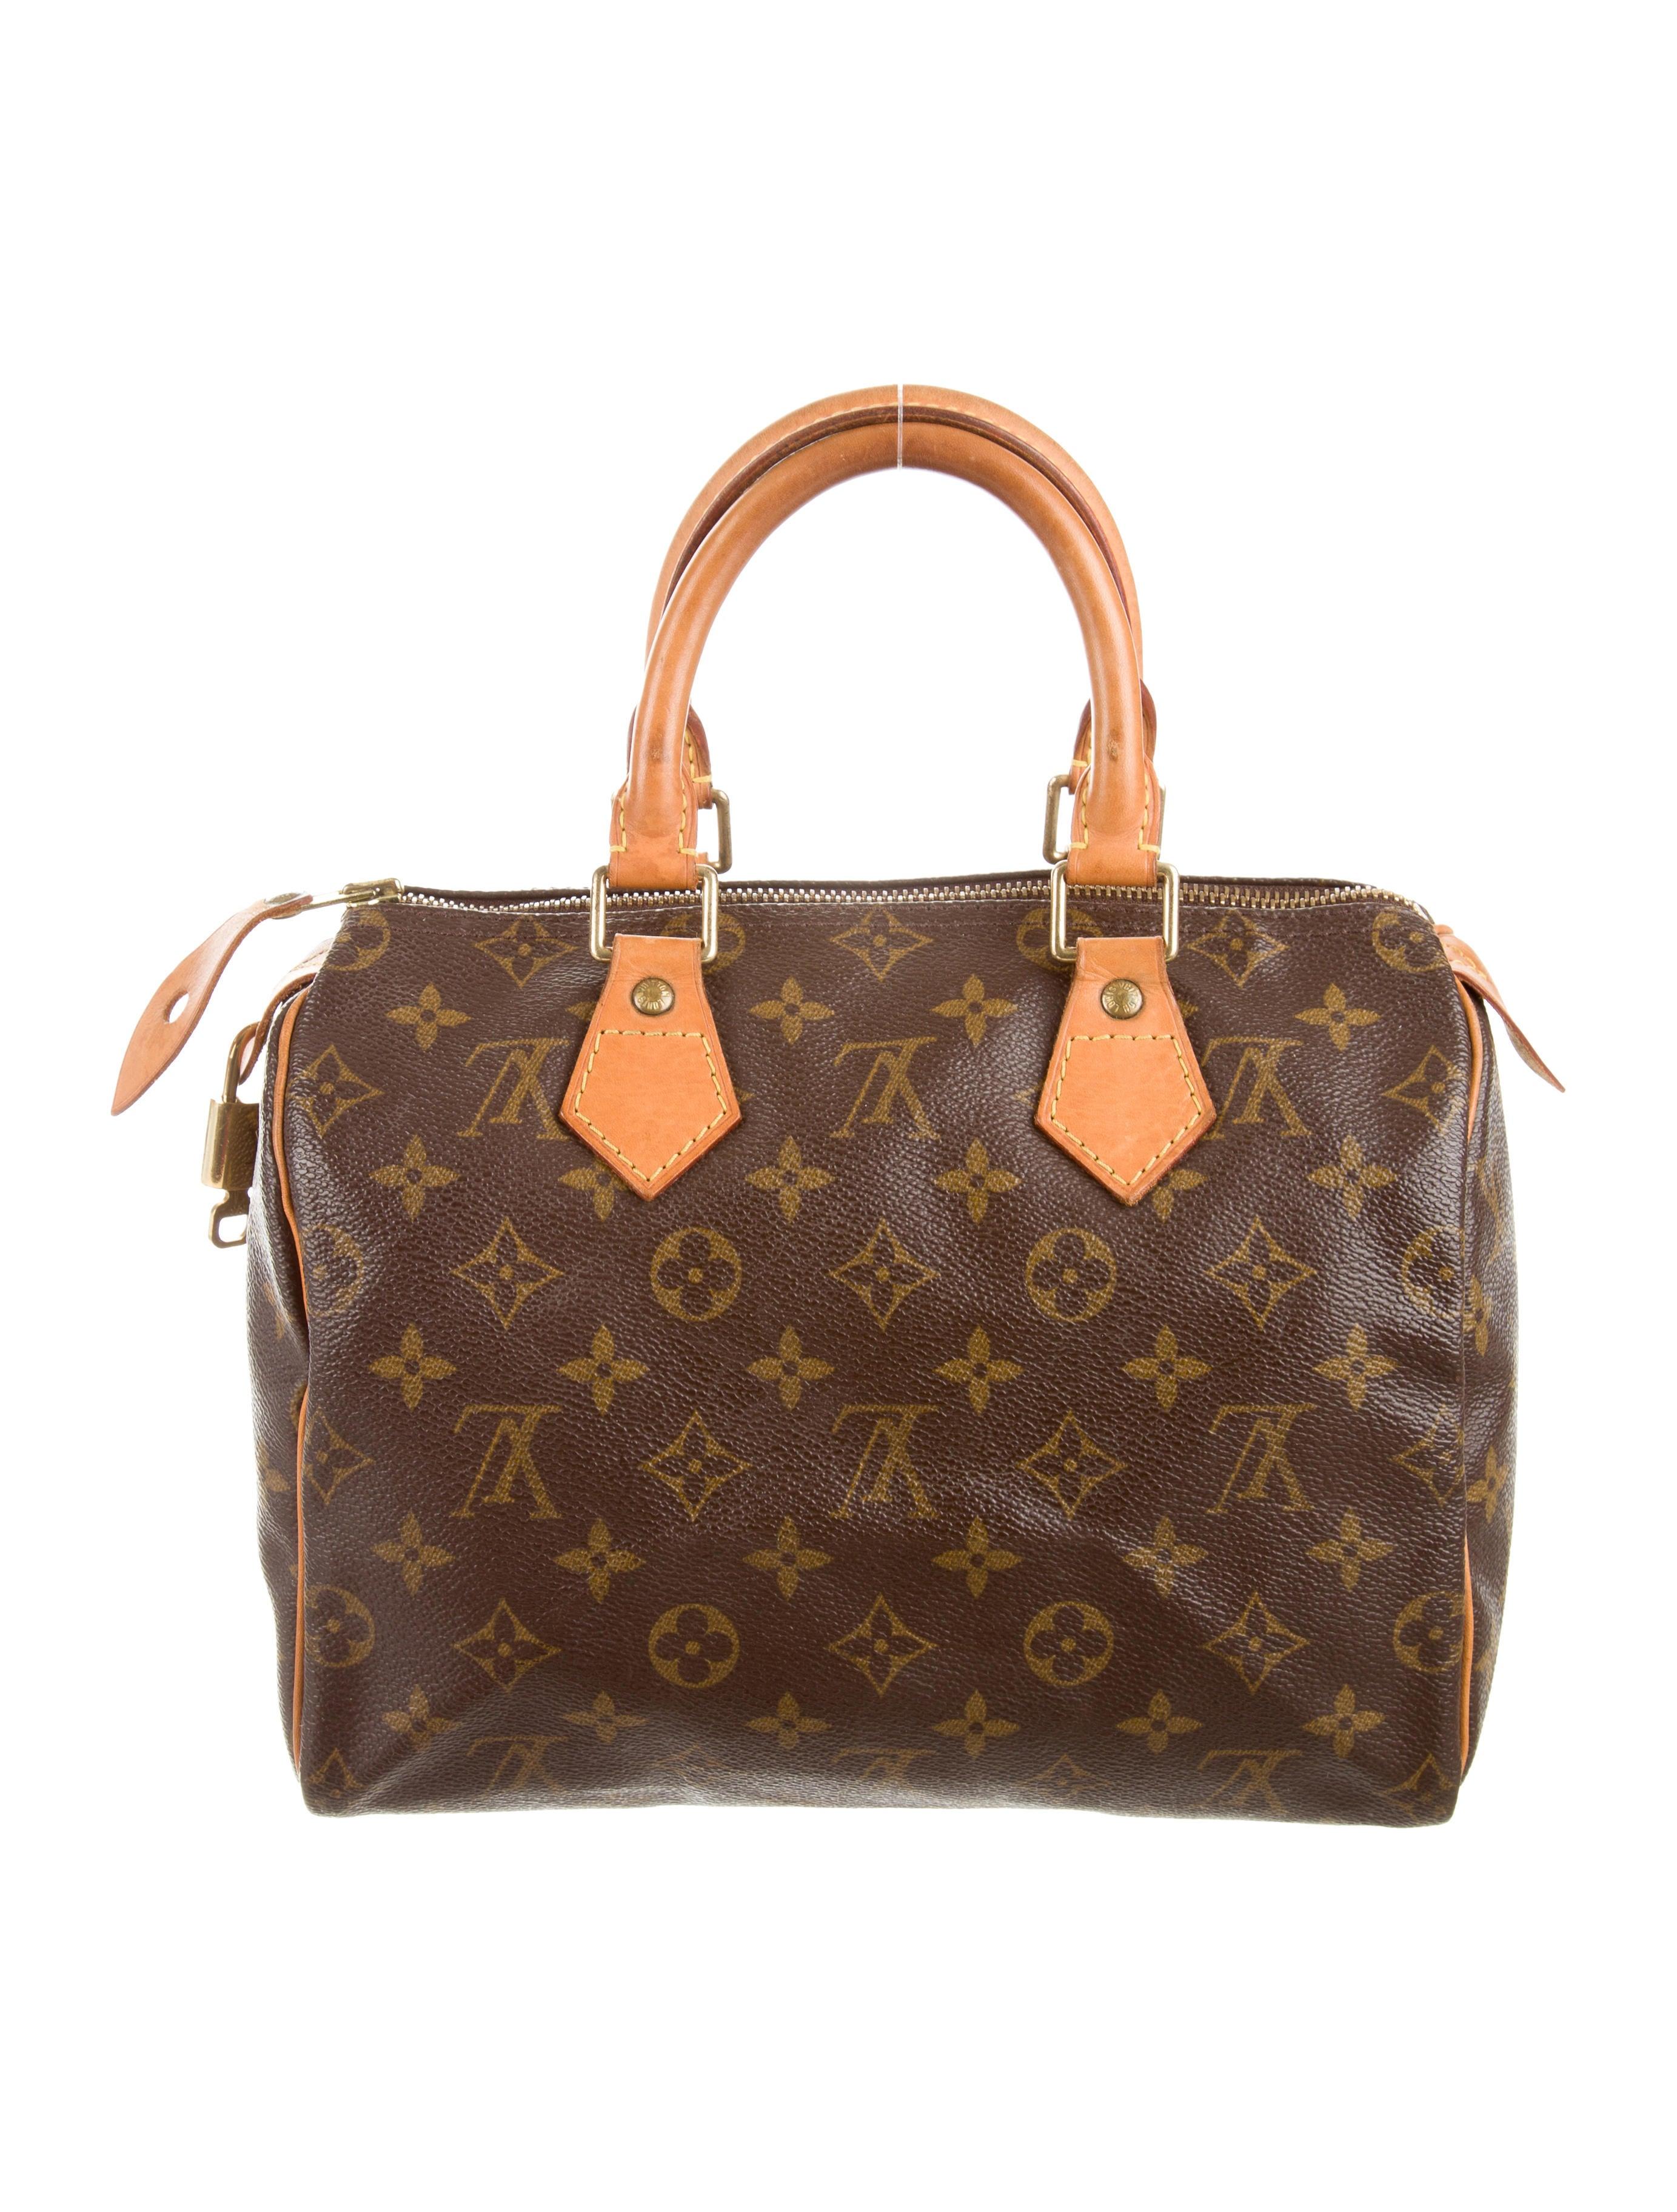 louis vuitton monogram speedy 25 - handbags